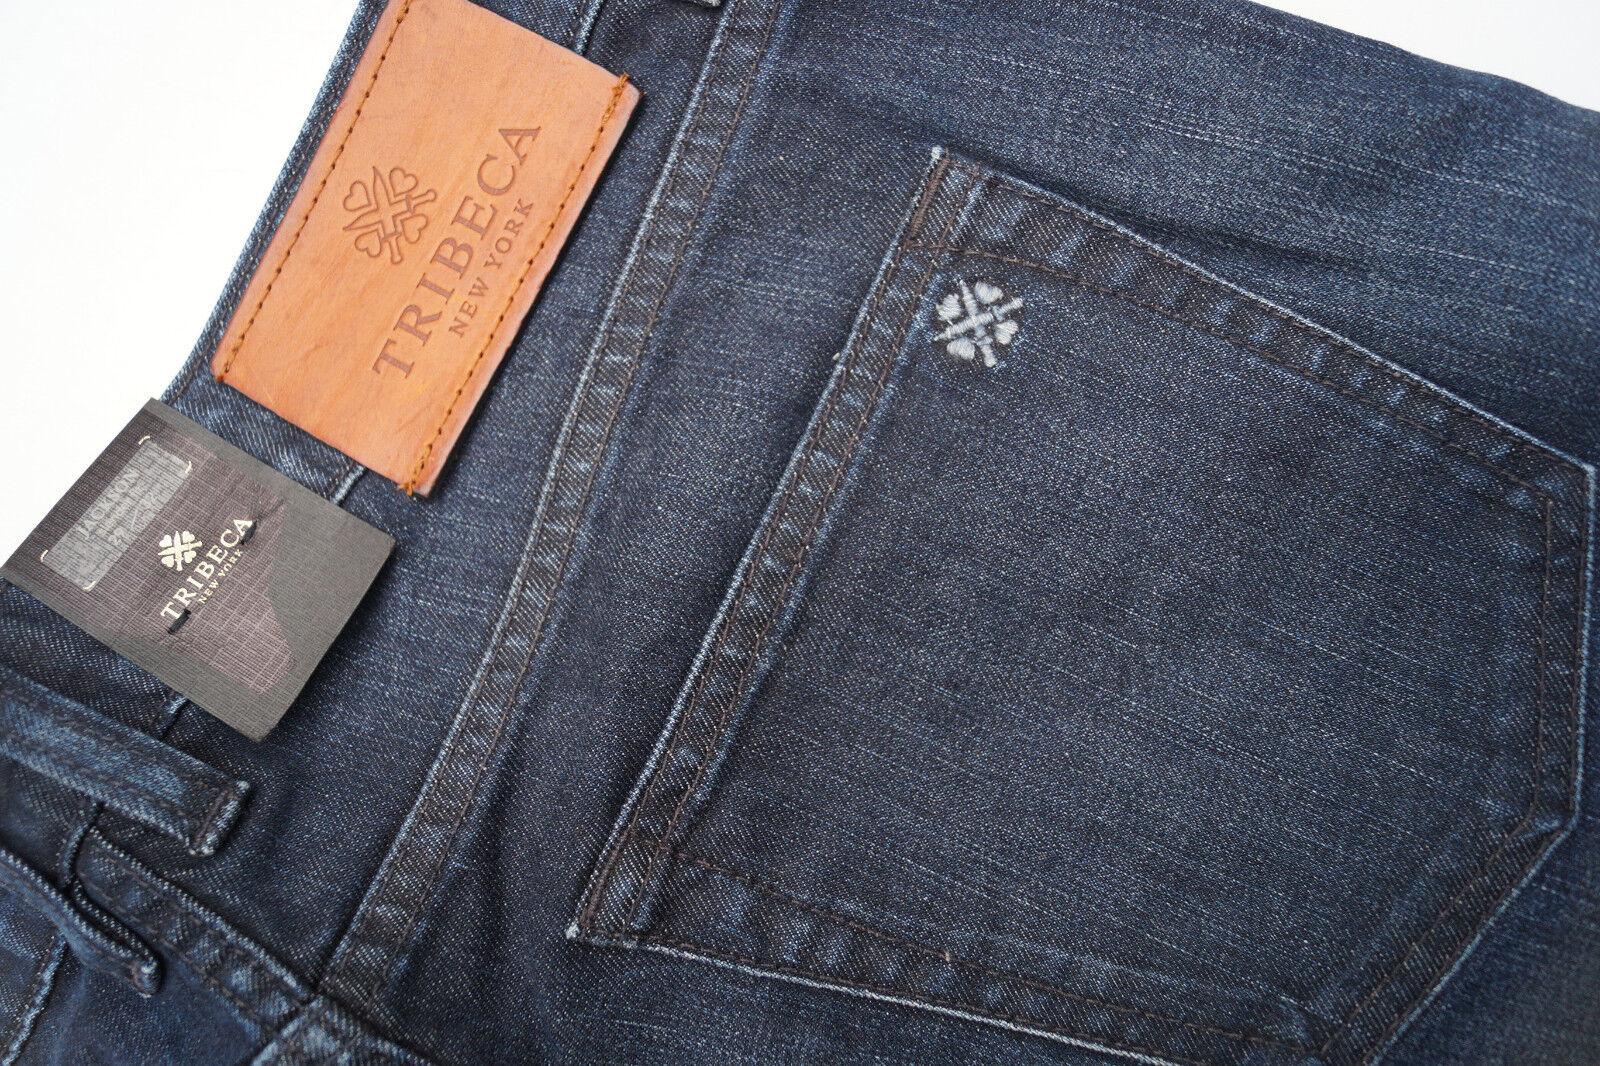 TRIBECA NY Jackson slender fit Herren Jeans stretch Hose 29 32 W29 L32 blau NEU